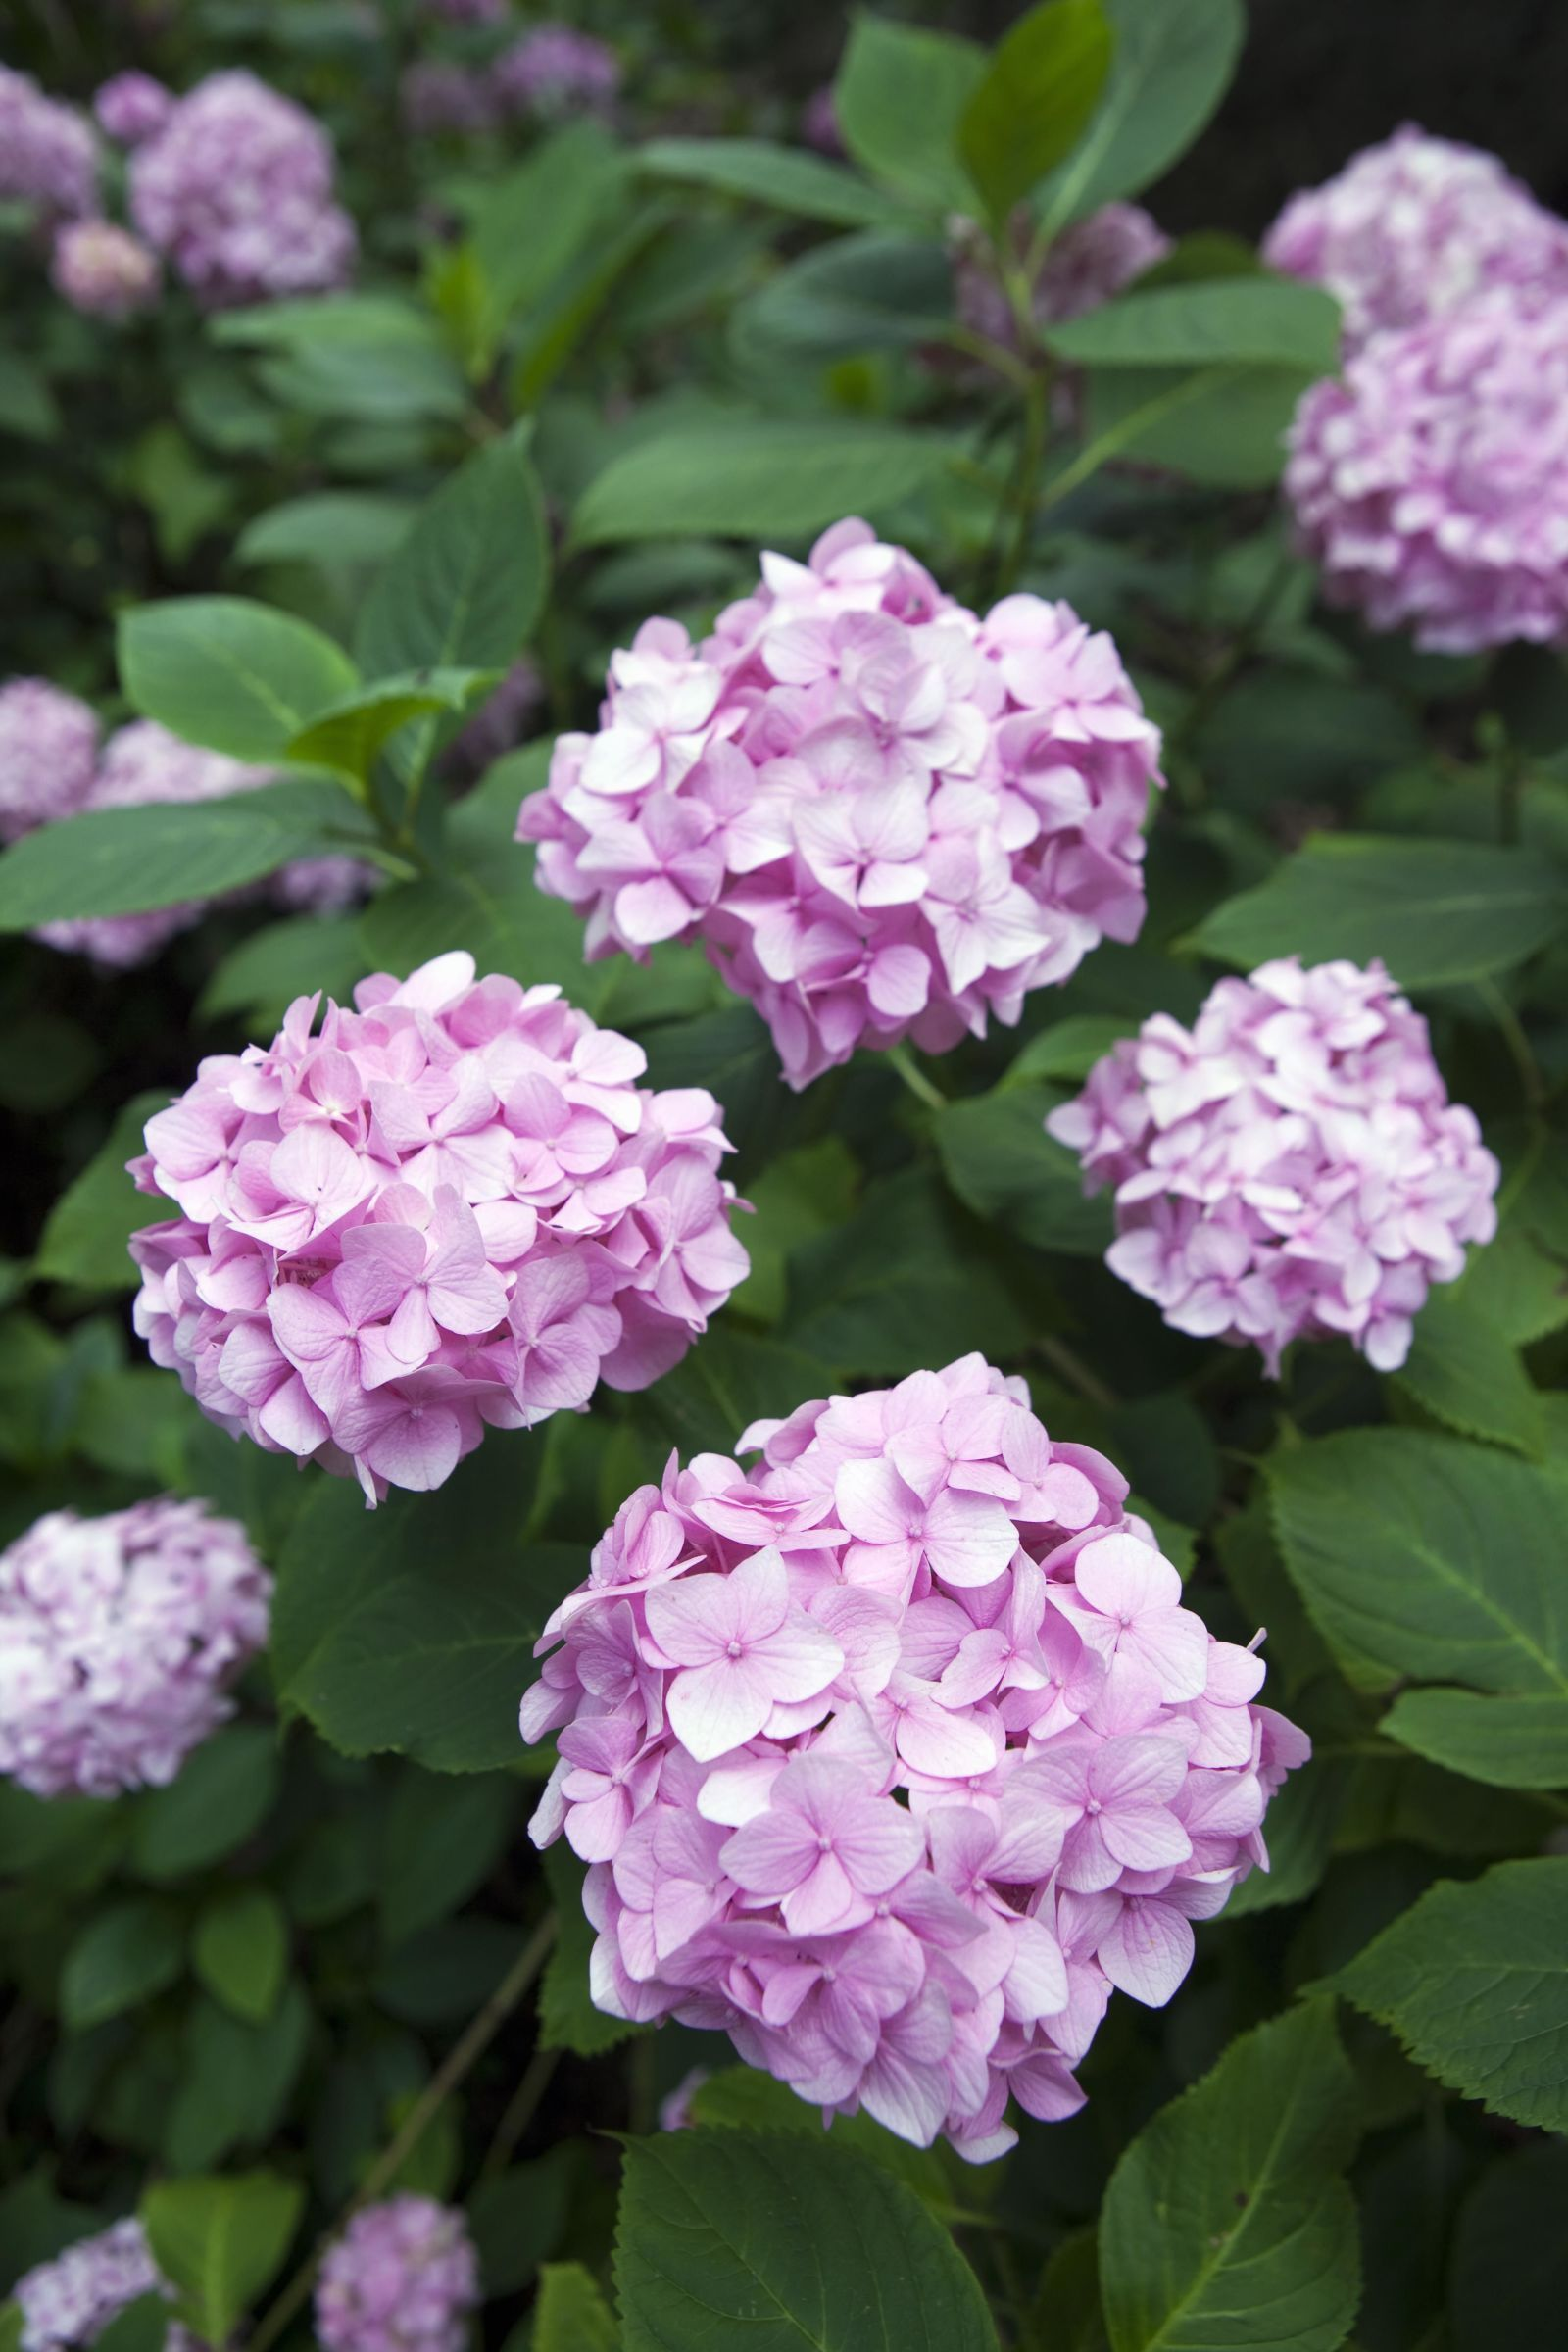 This Cool Trick Can Make Your Hydrangeas Last Much Longer Plants Growing Hydrangeas Planting Hydrangeas